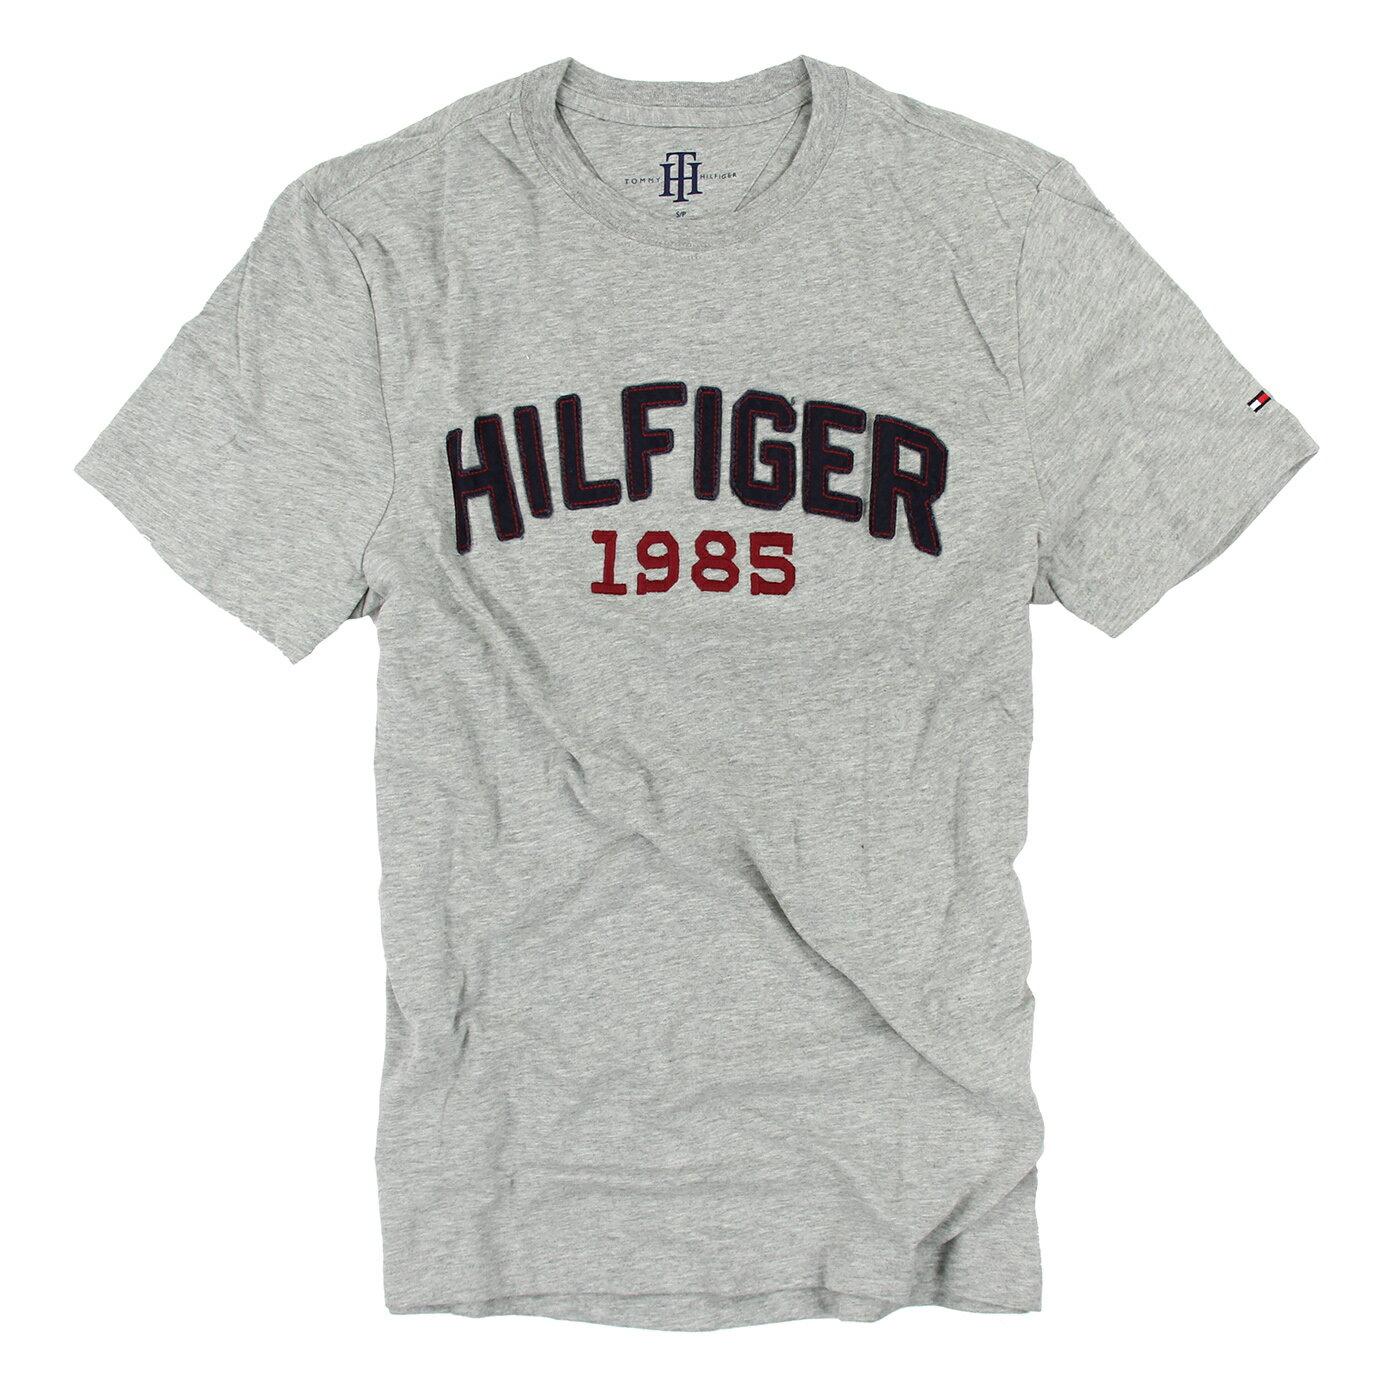 美國百分百【Tommy Hilfiger】T恤 TH 男 圓領 T-shirt 短袖 LOGO 短T 灰色 S XXL號 F040